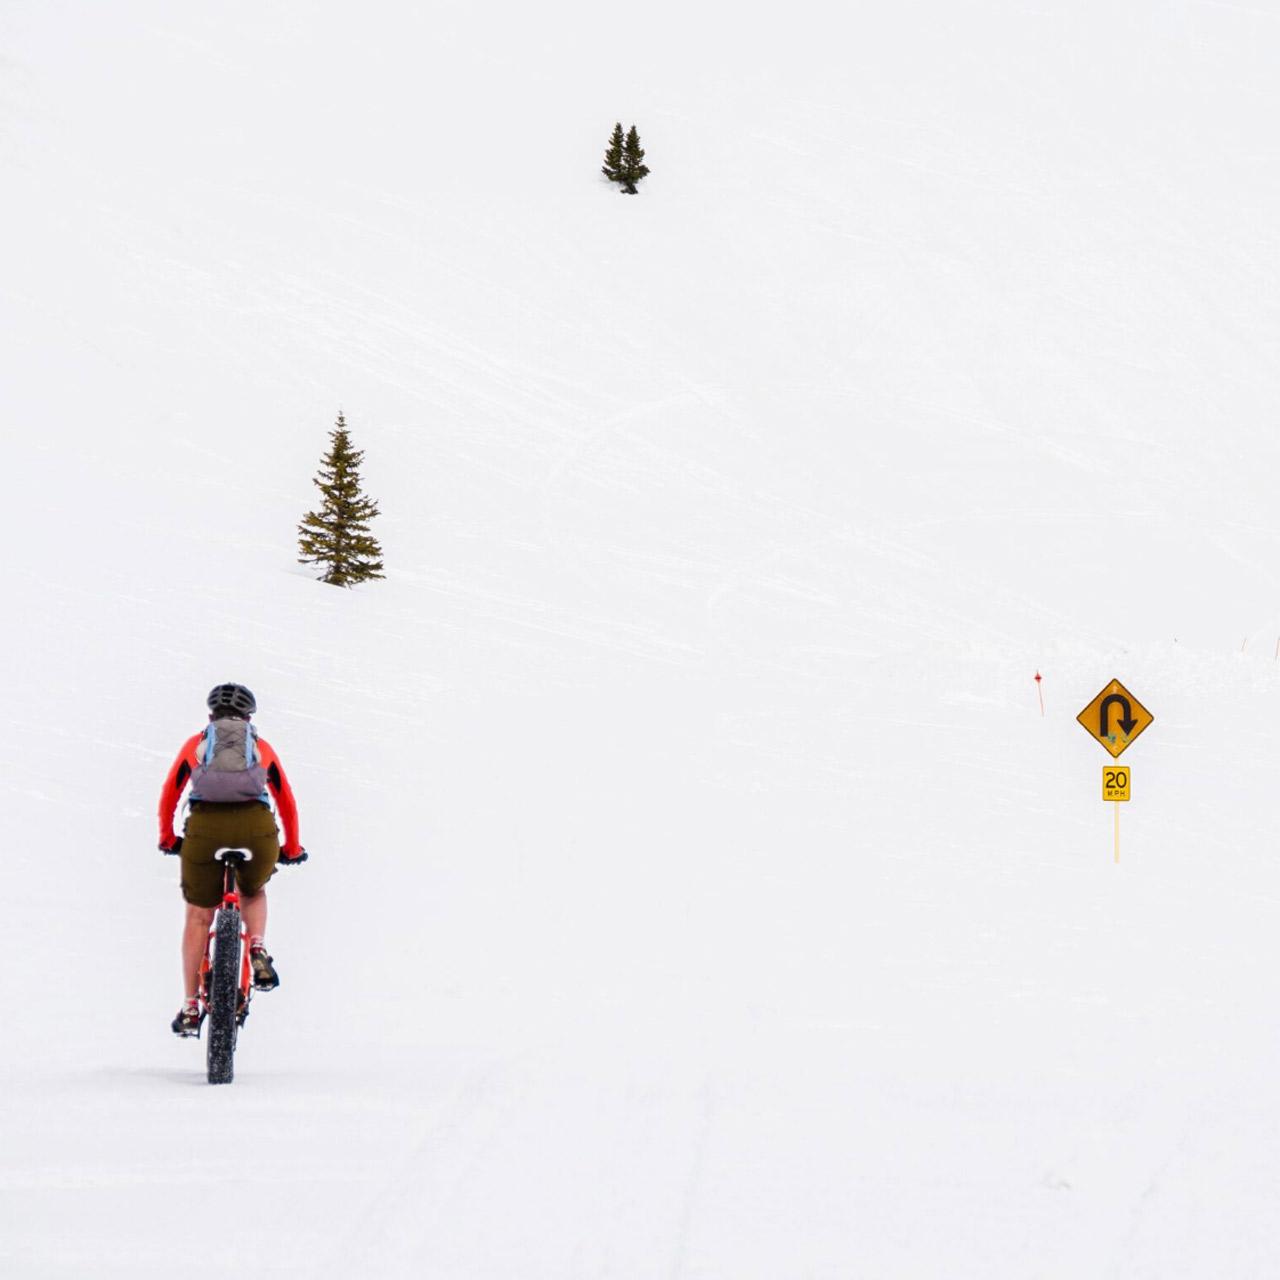 RBR_cottonwood-pass-summit_07